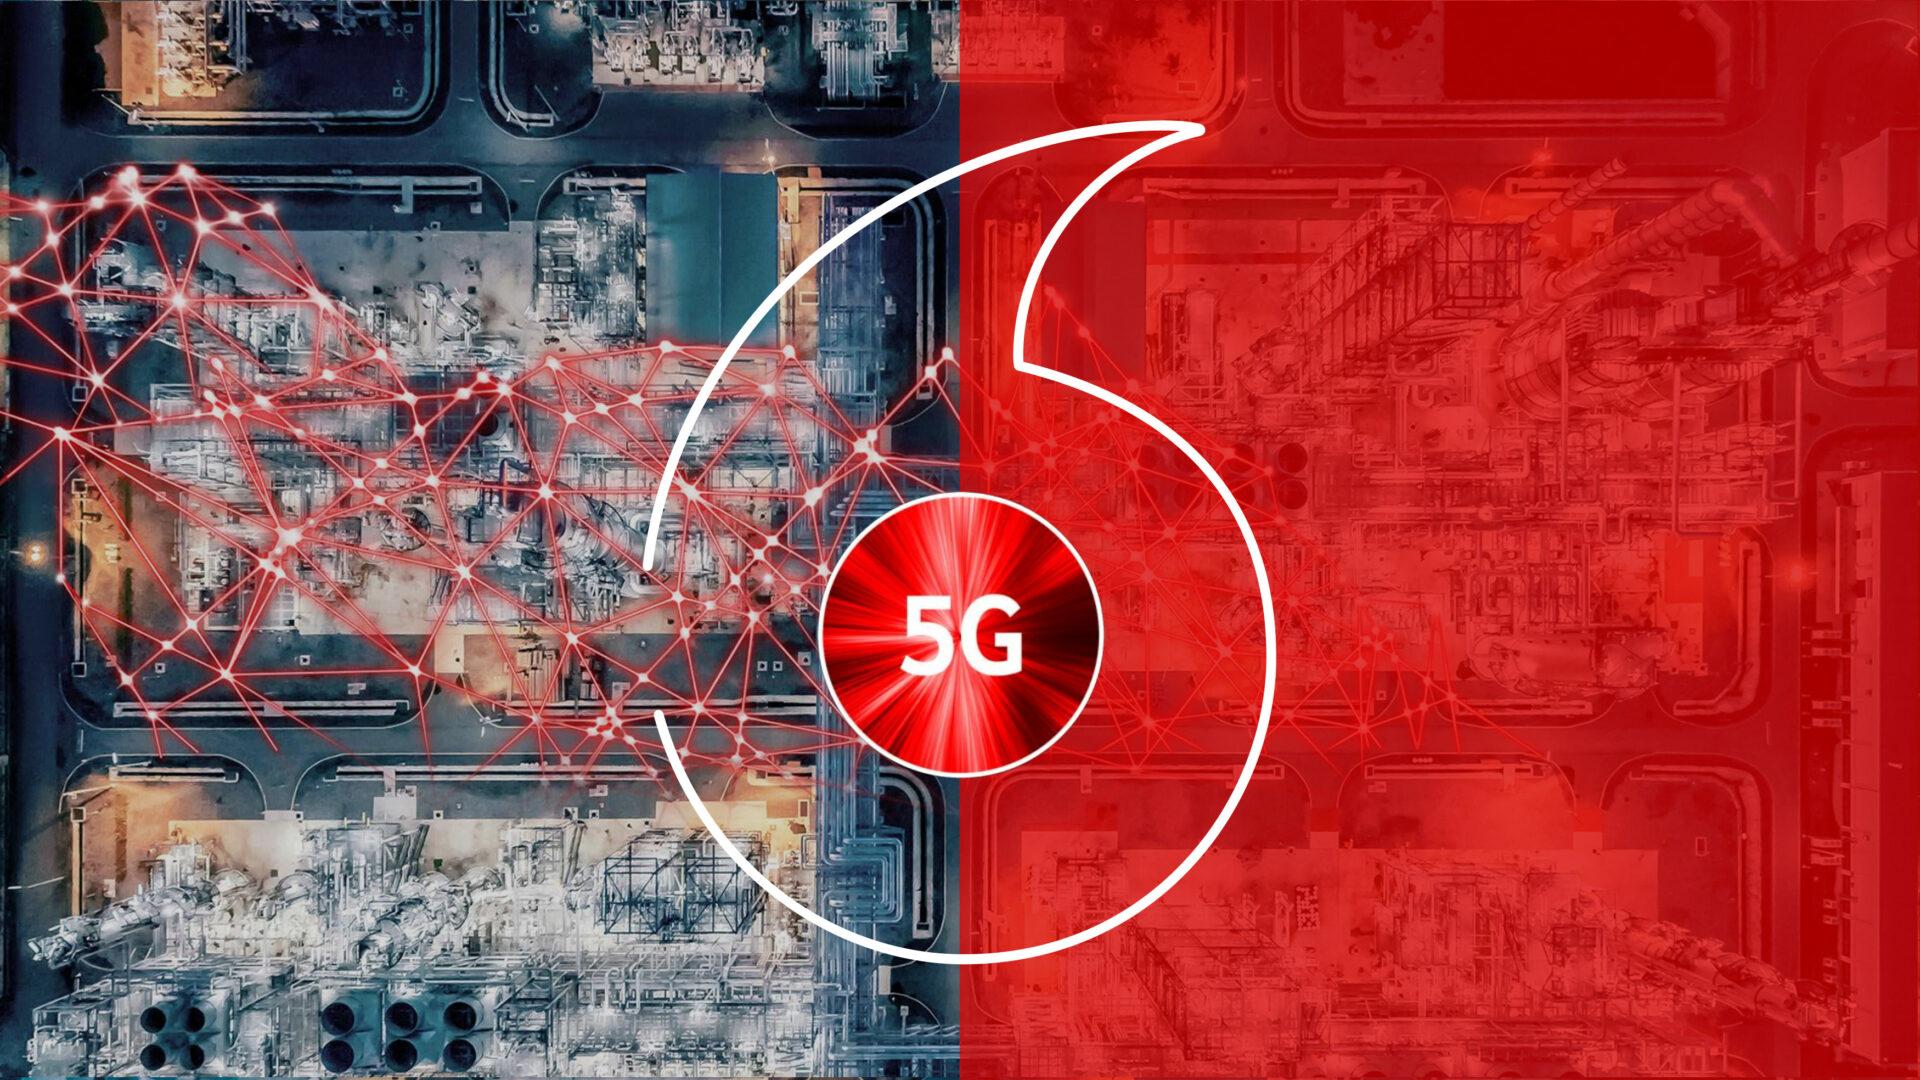 Pokrytí 5G Vodafone